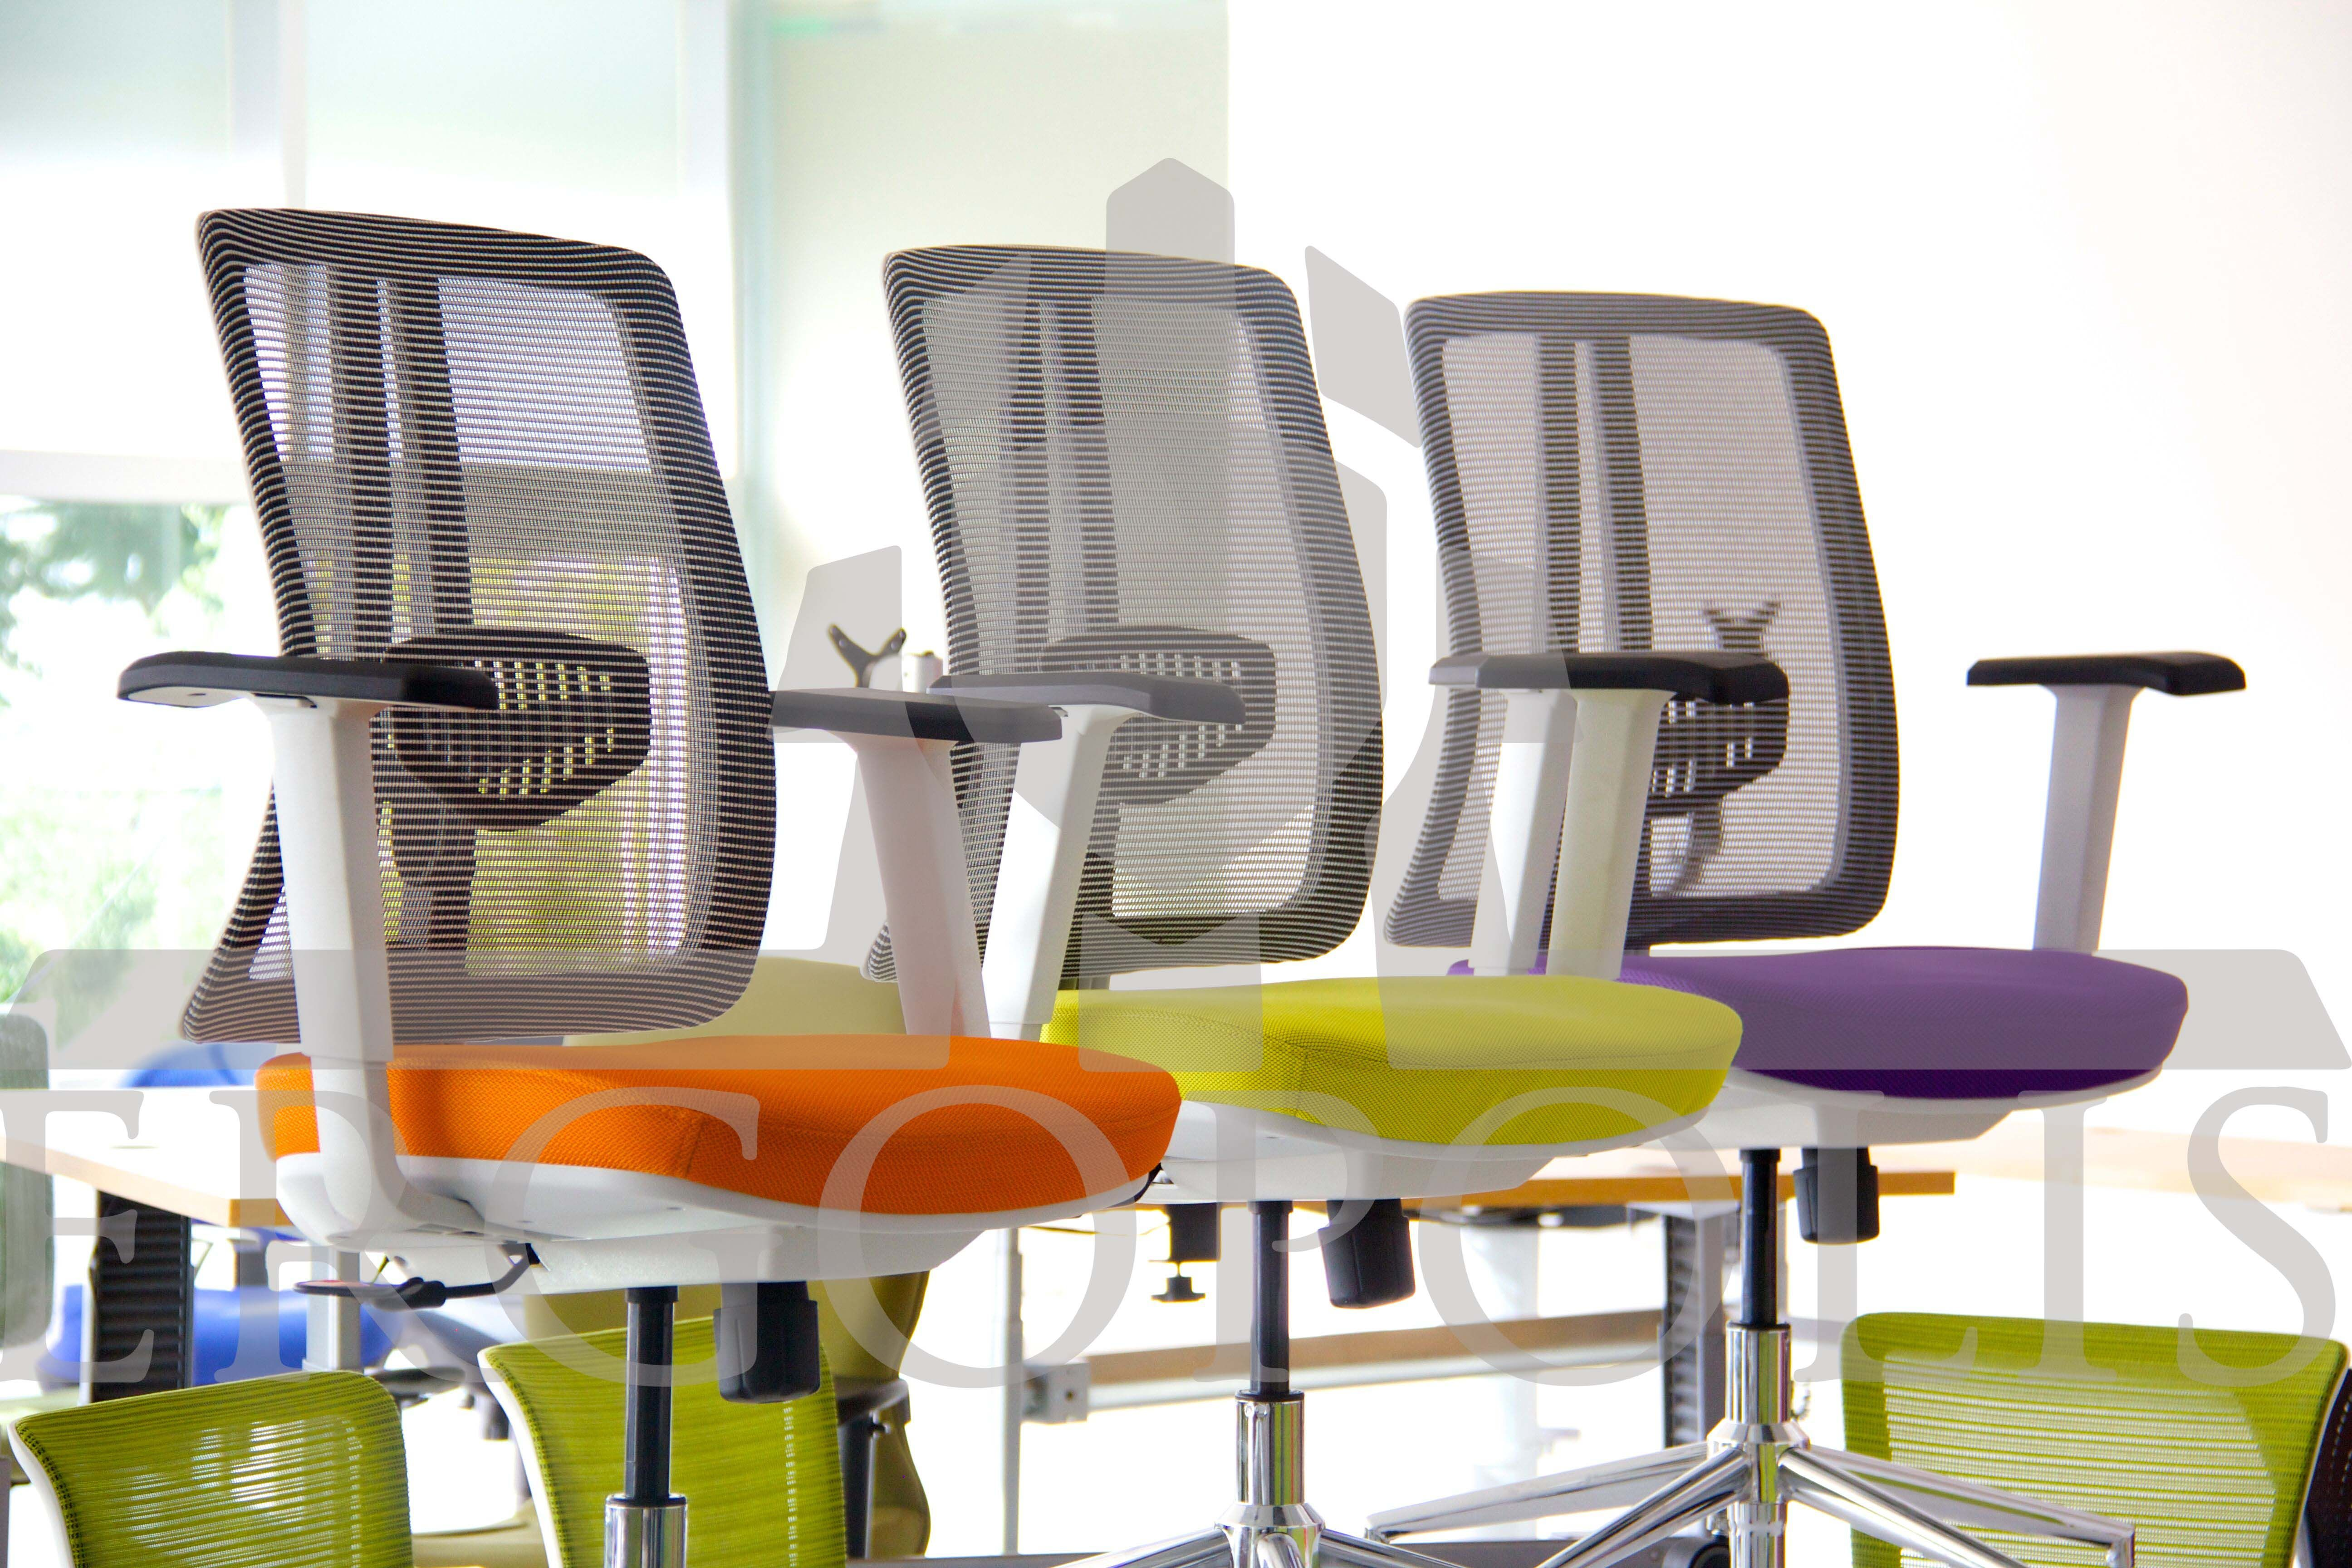 Sillas #AMELIA con asiento tapizado en colores vivos. #Ergonomia #Oficina #Ergopolis #Sillas